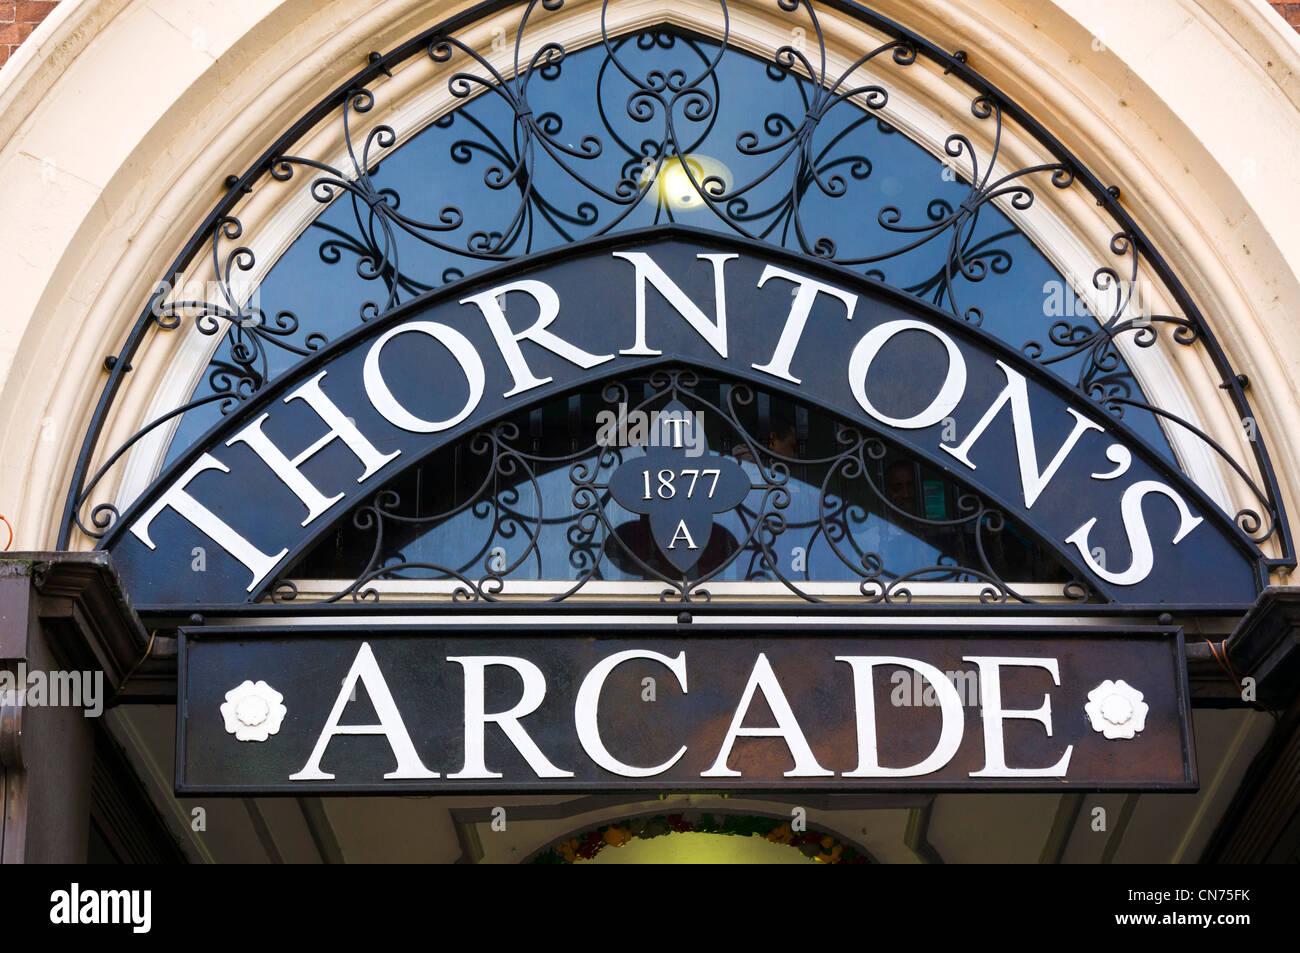 Entrance to Thornton's Arcade, Briggate, Leeds, West Yorkshire, England - Stock Image